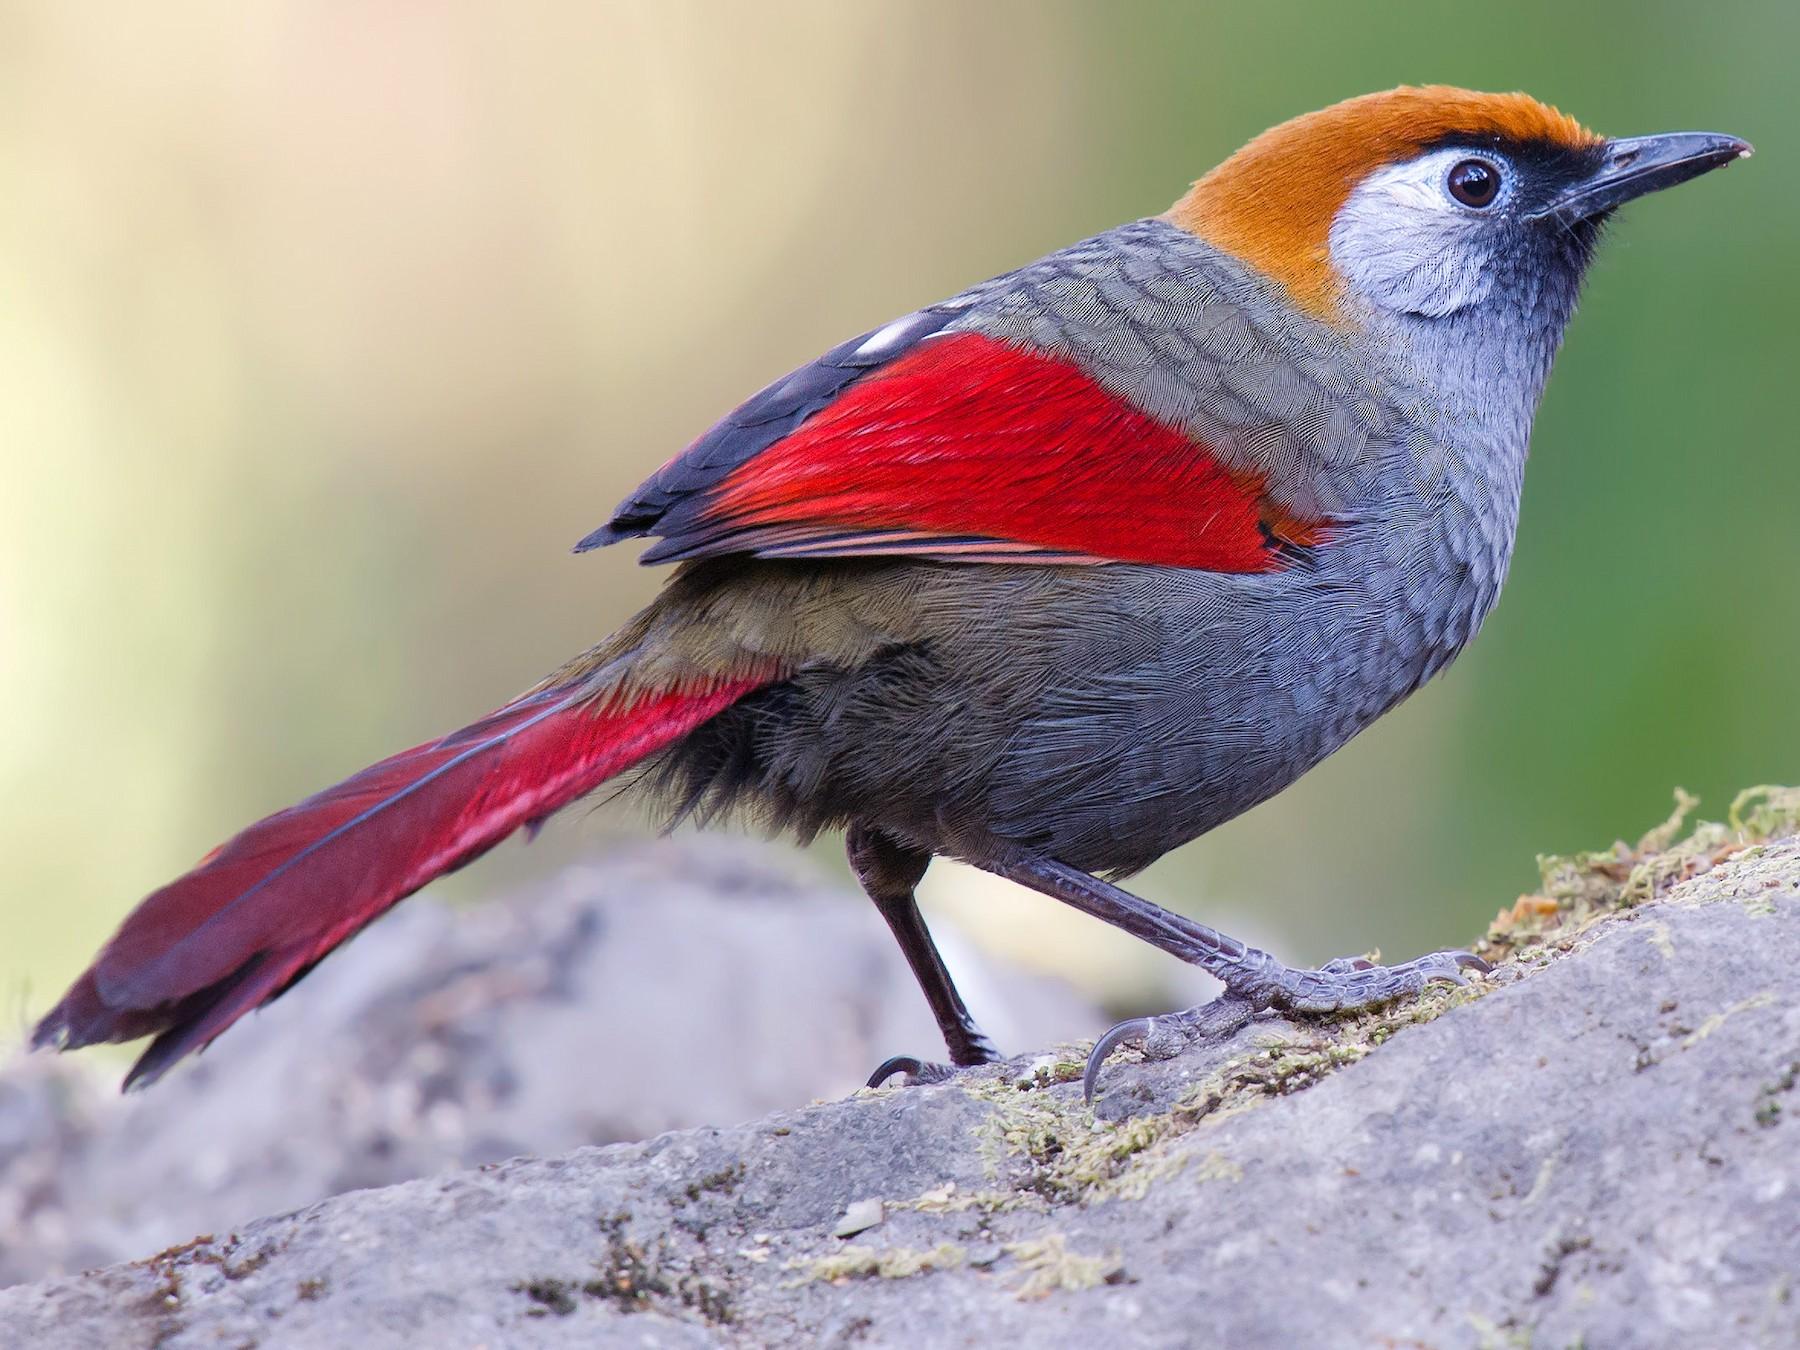 Red-tailed Laughingthrush - Craig Brelsford